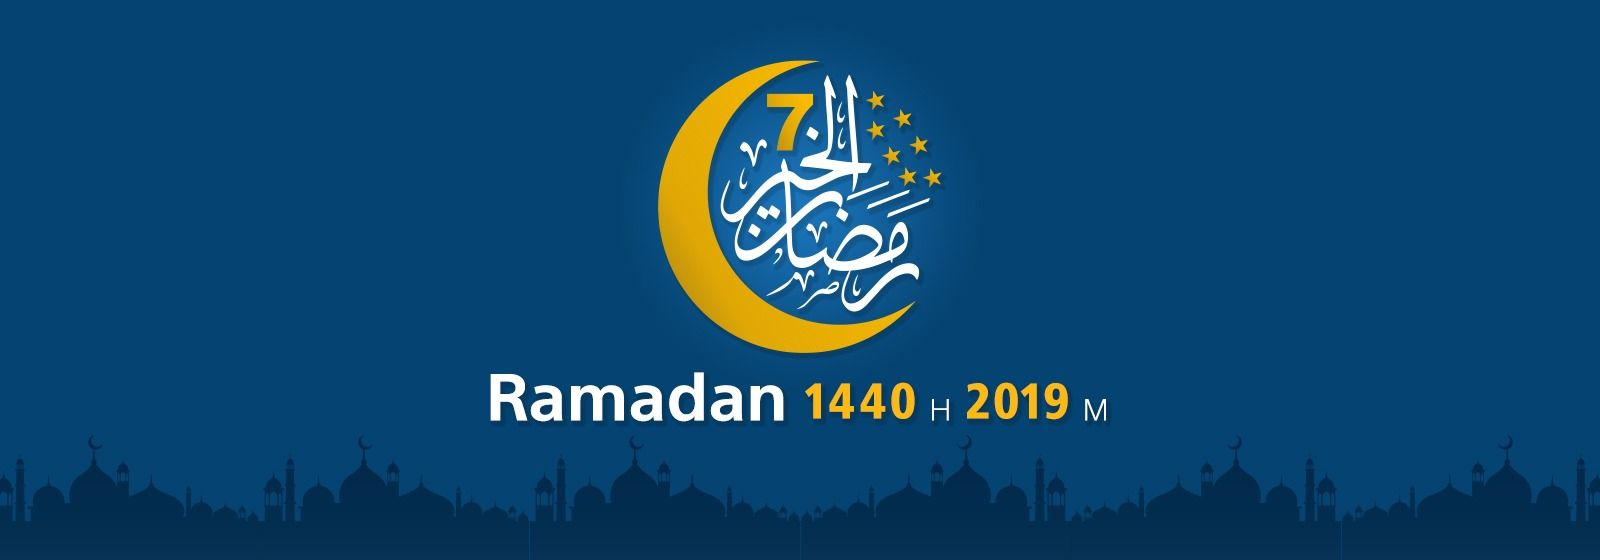 Ramadan In Syria And Turkey Ramadan How To Remove The Fosters